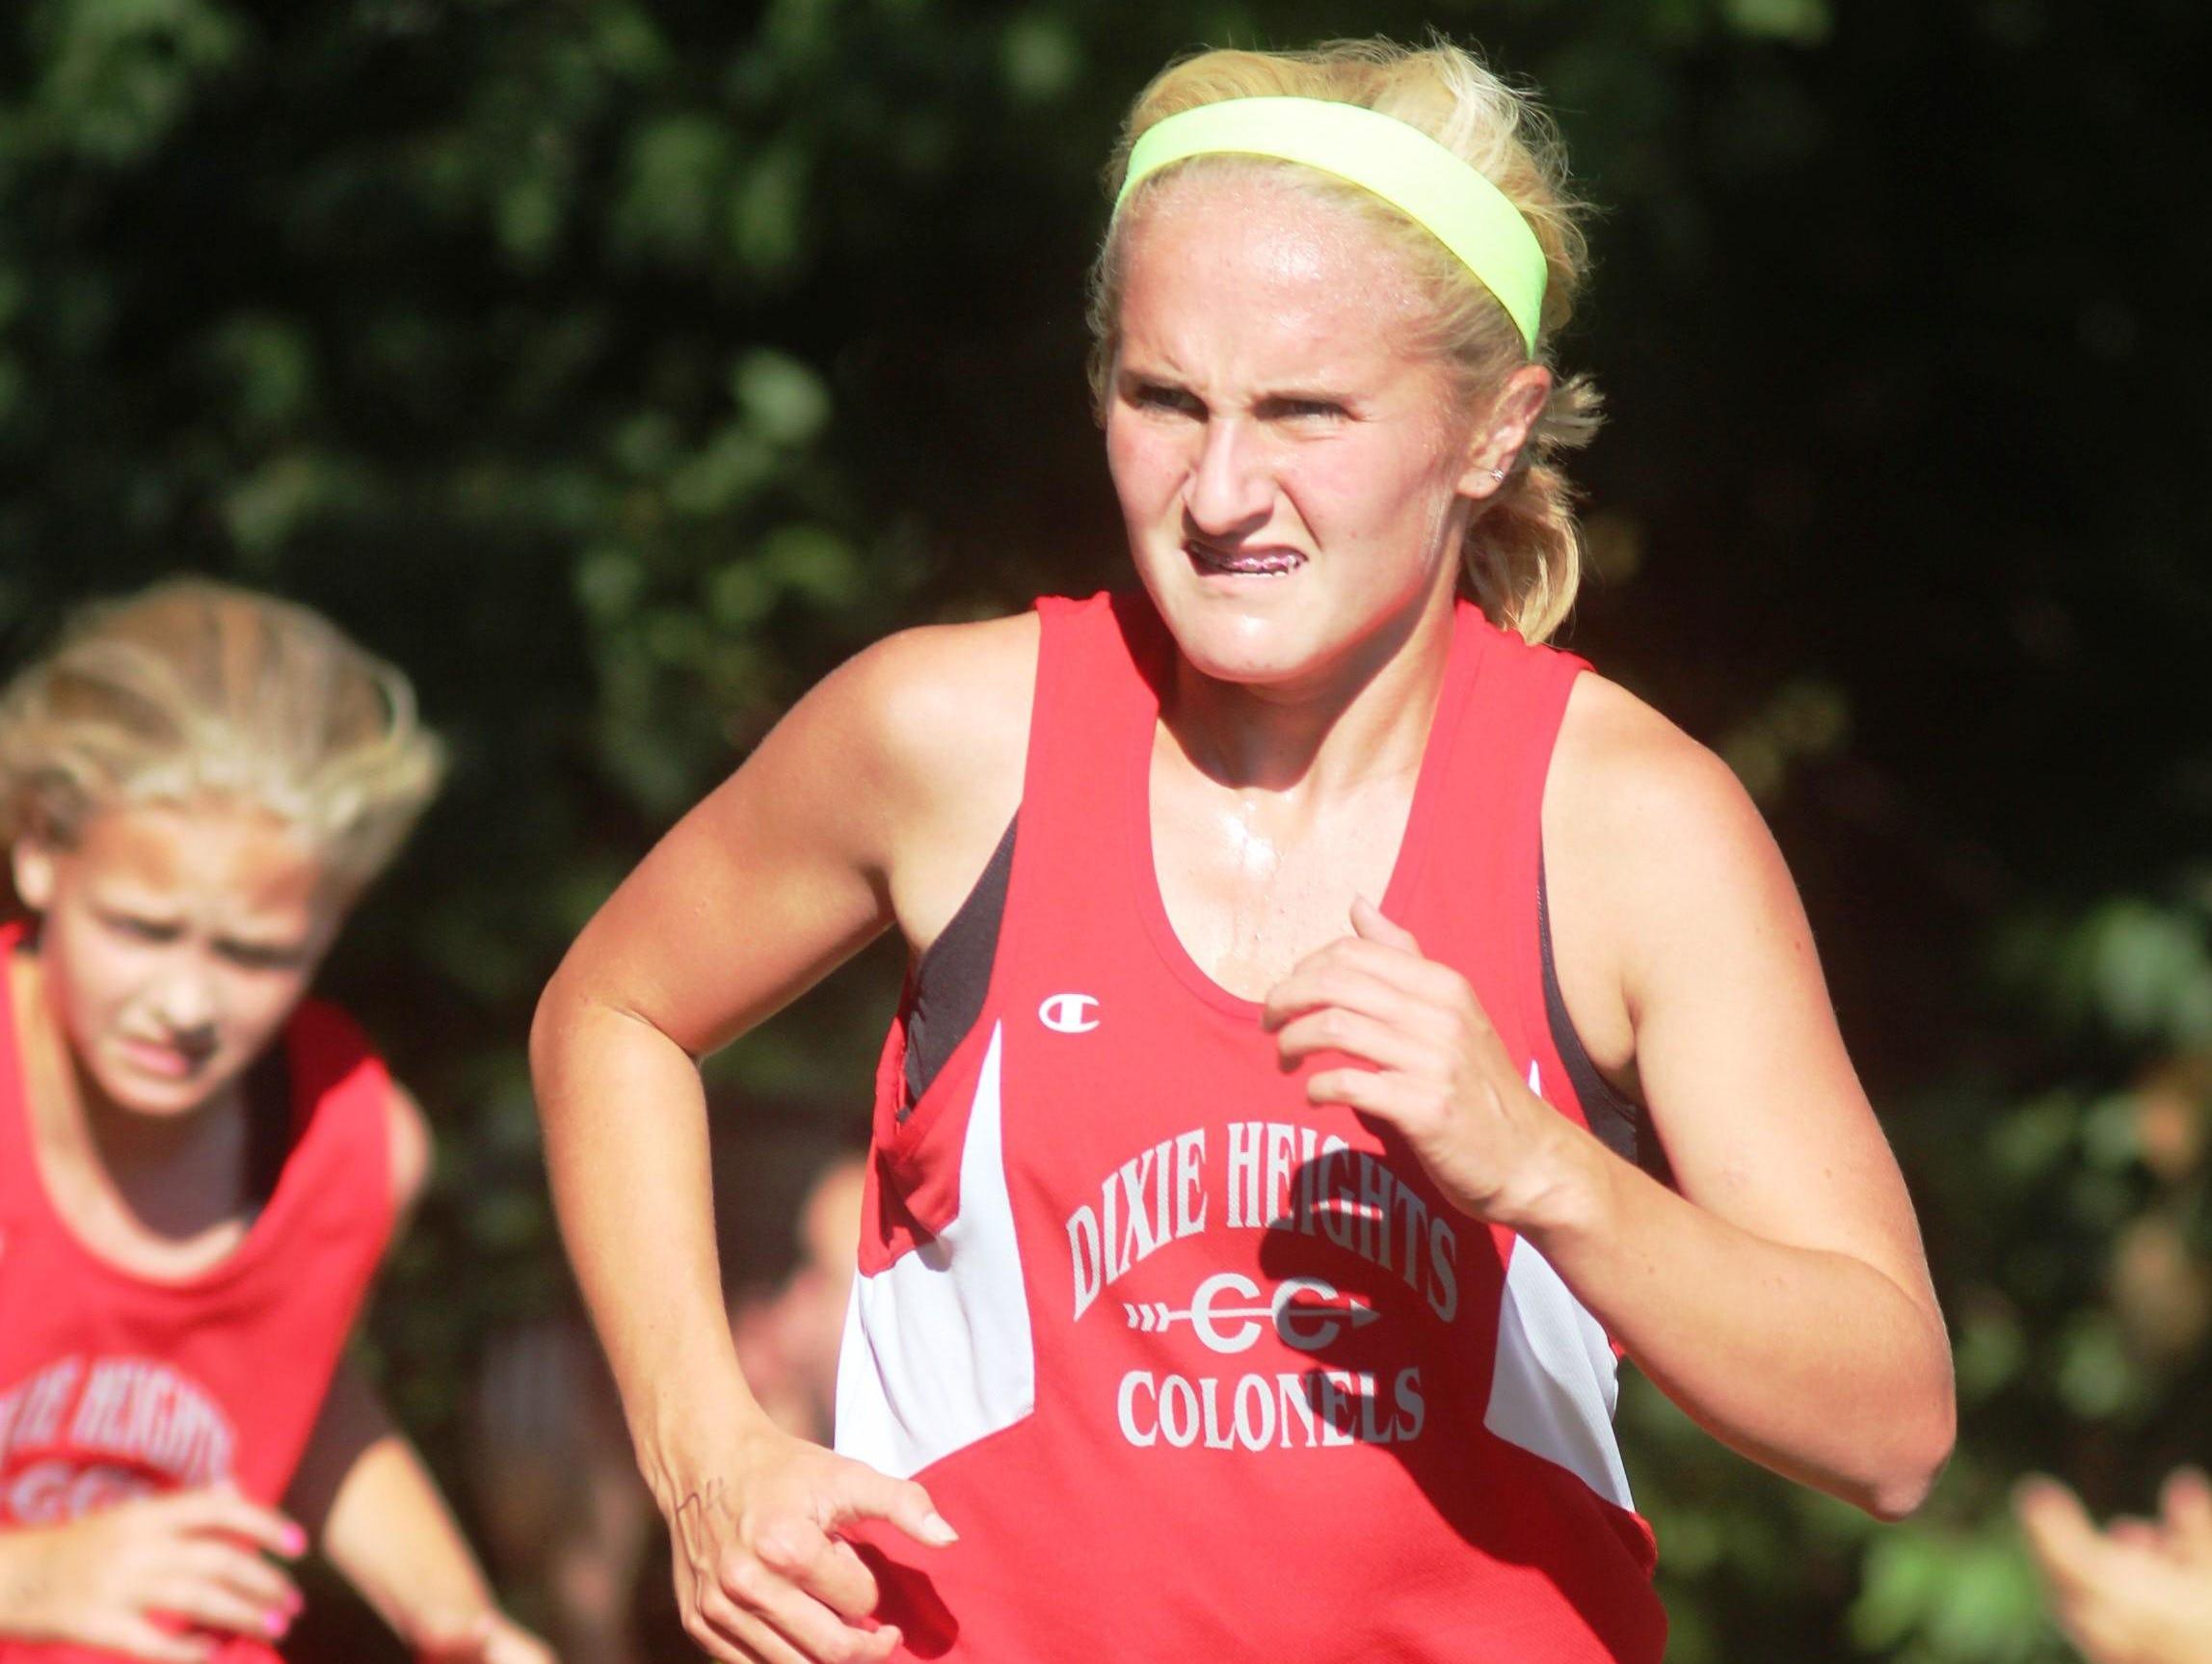 Dixie Heights freshman Nicole Marker, front, with teammate Lexi Plitzuweit.